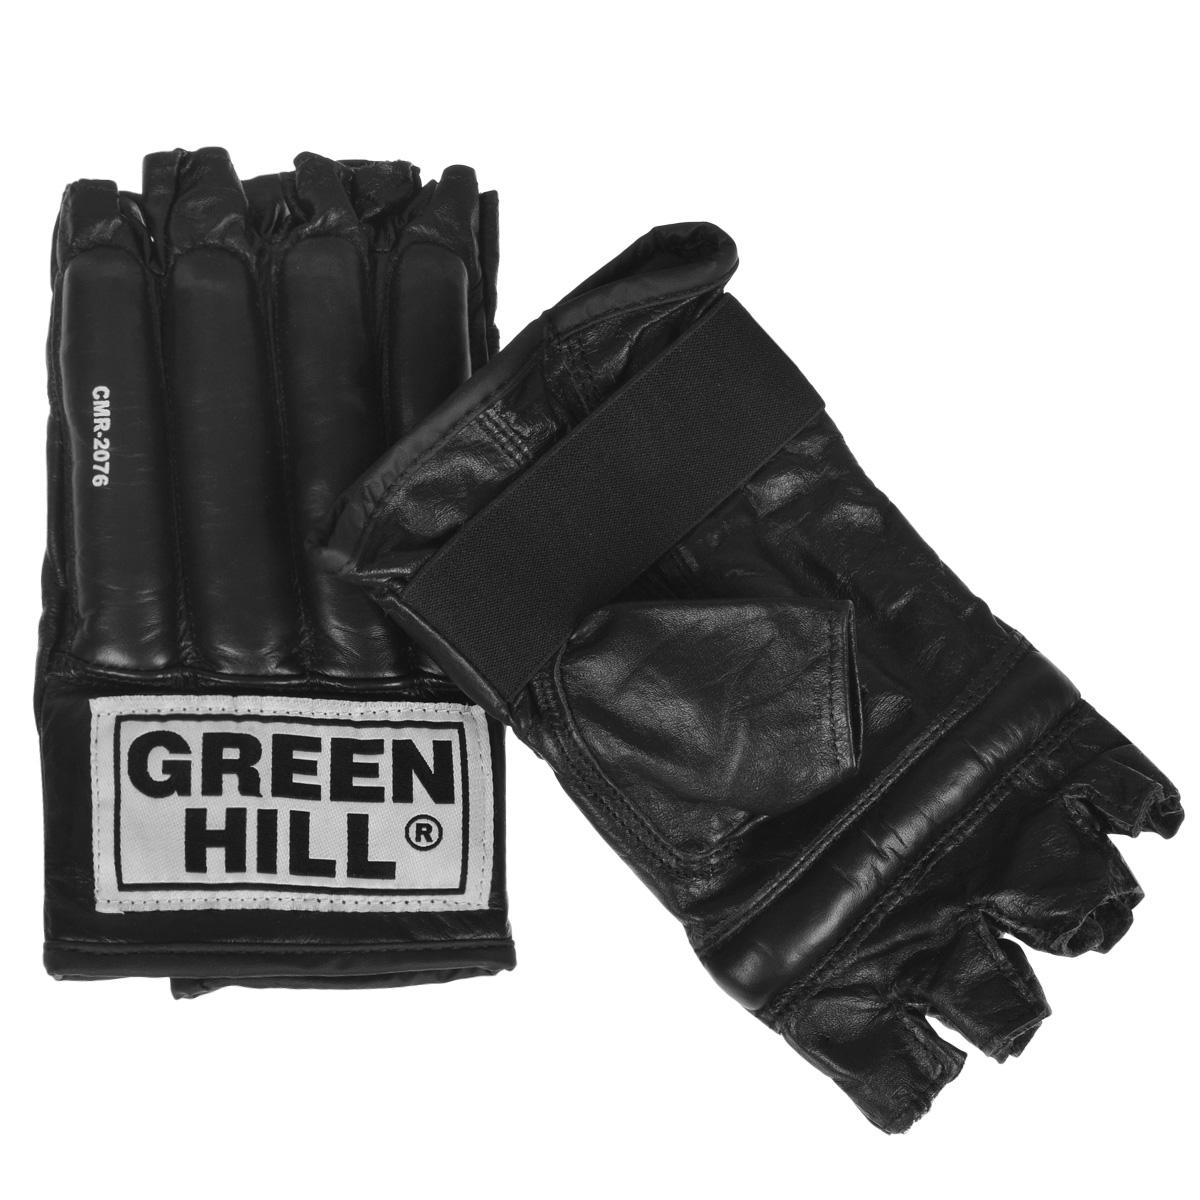 Шингарты для единоборств Green Hill Royal, цвет: черный. Размер S green hill куртка для самбо green hill